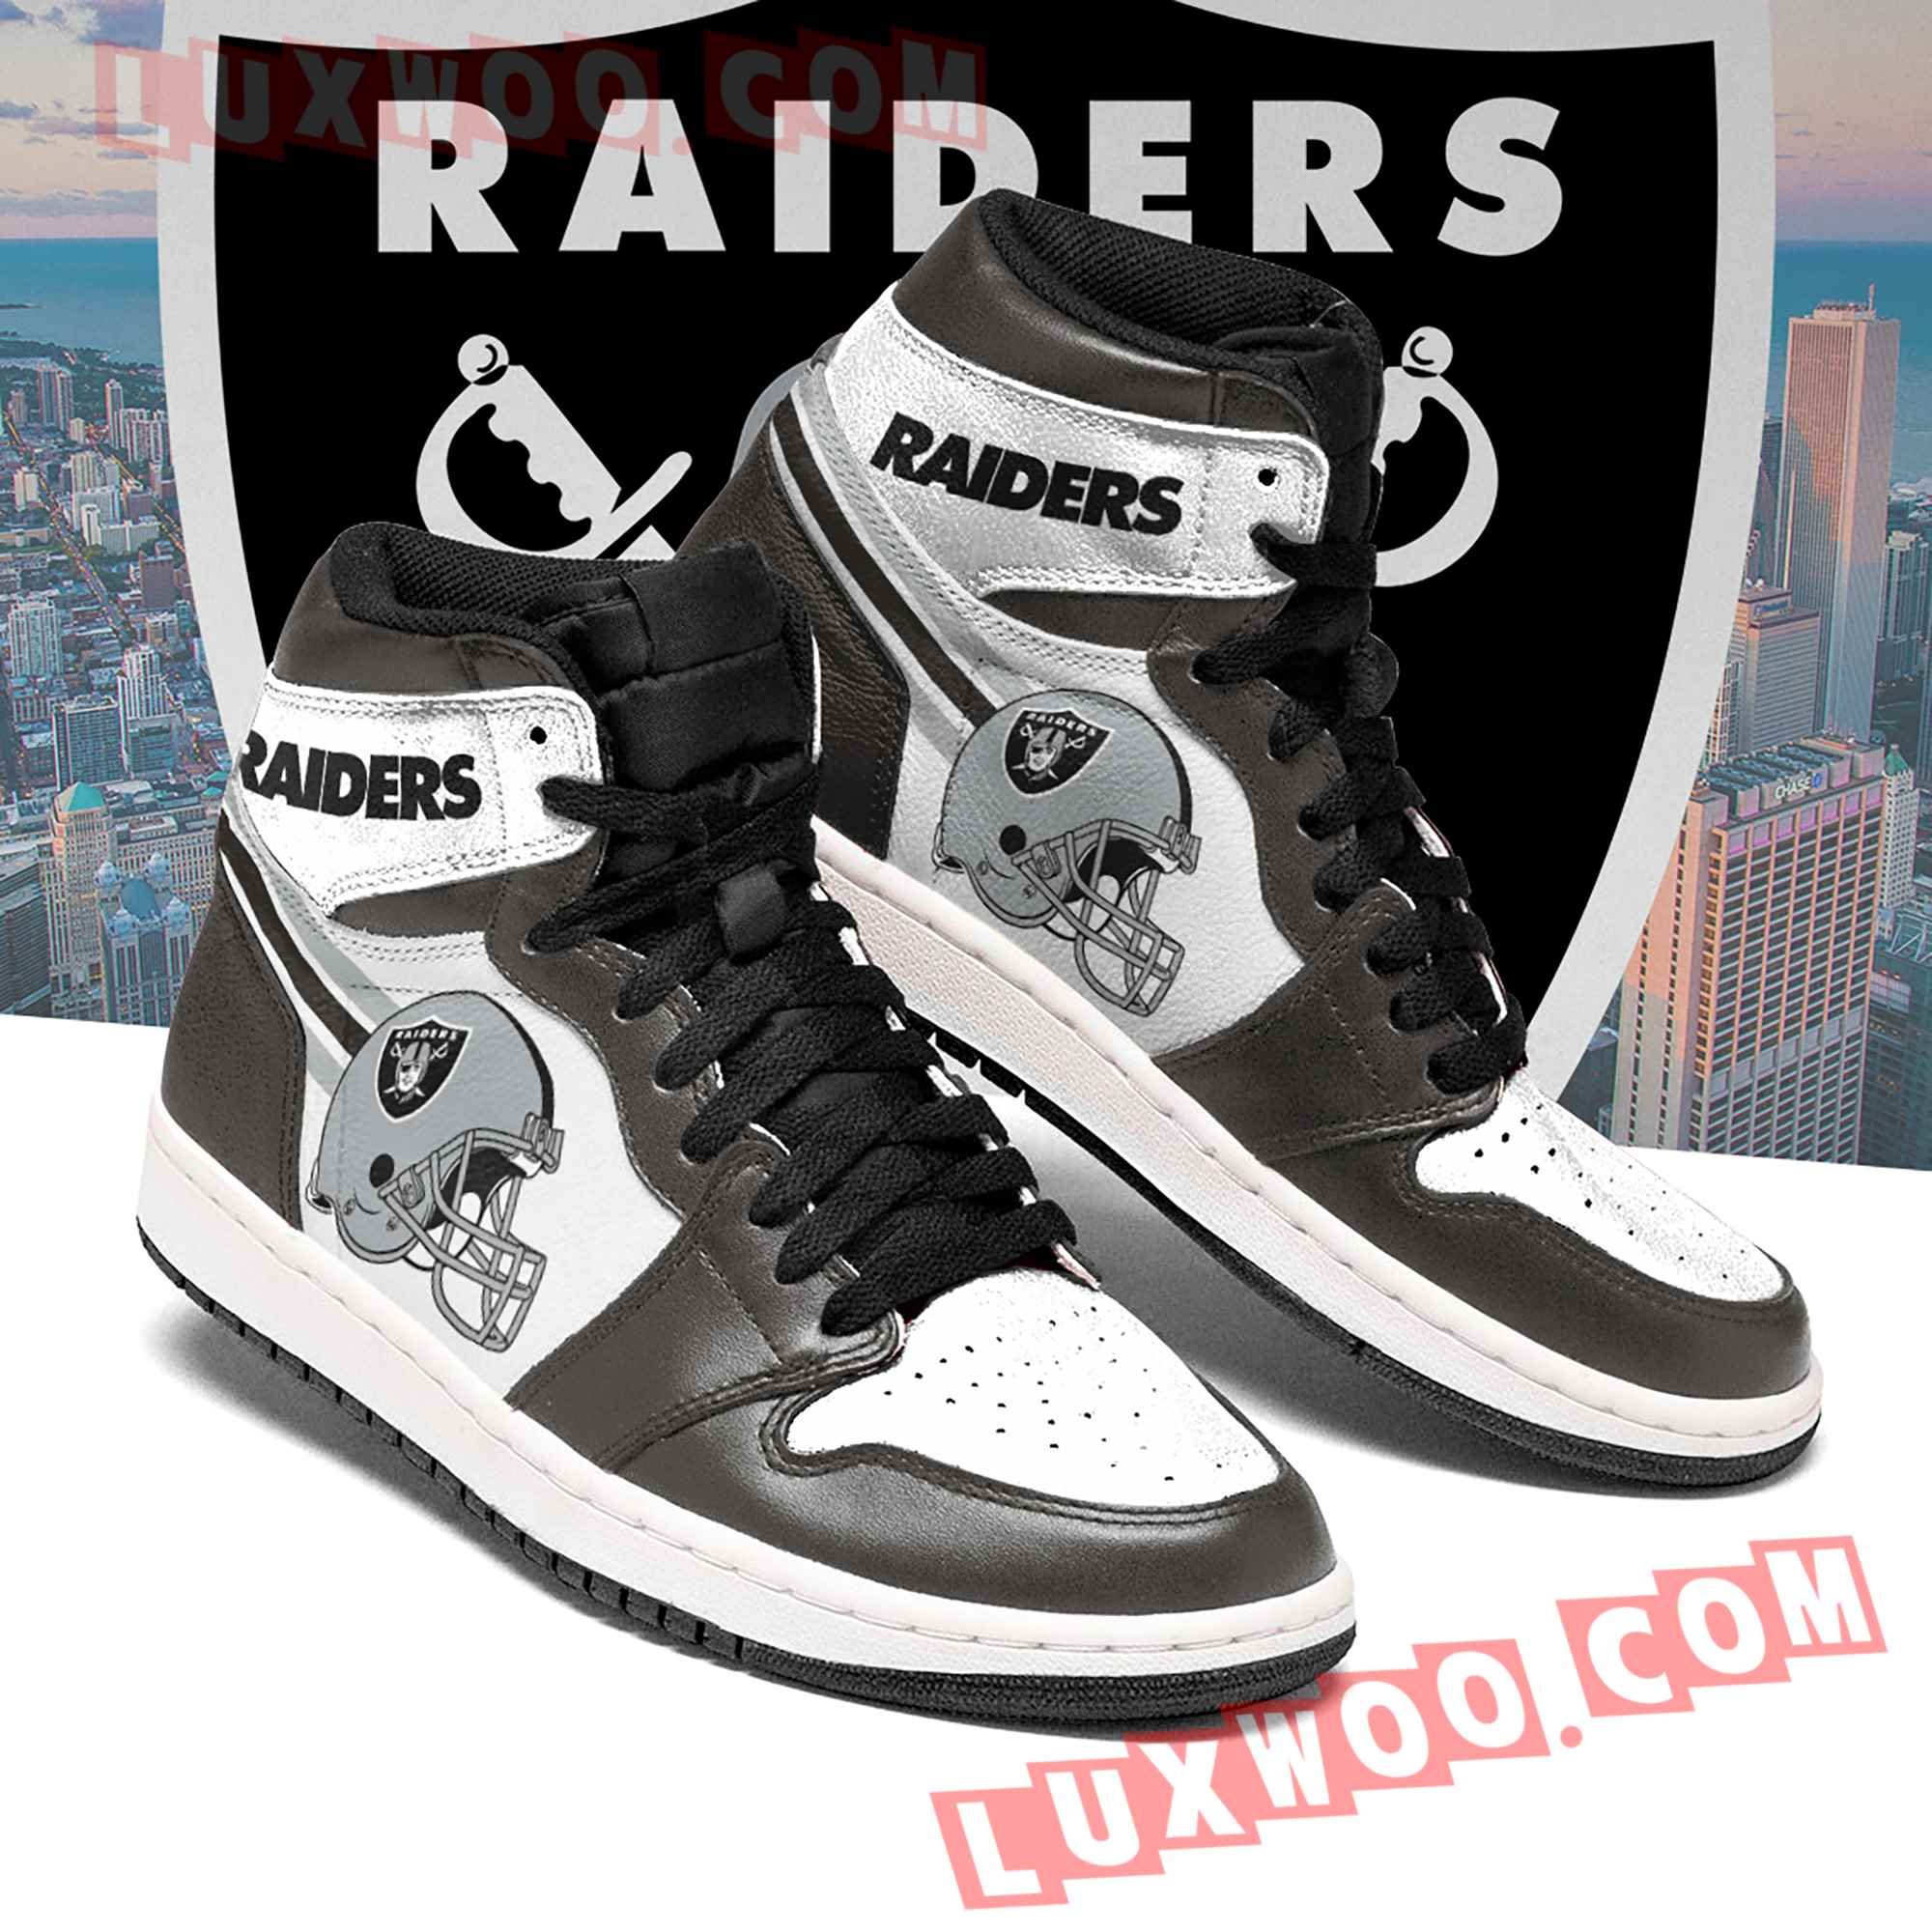 Oakland Raiders Nfl Air Jordan 1 Custom Shoes Sneaker V2